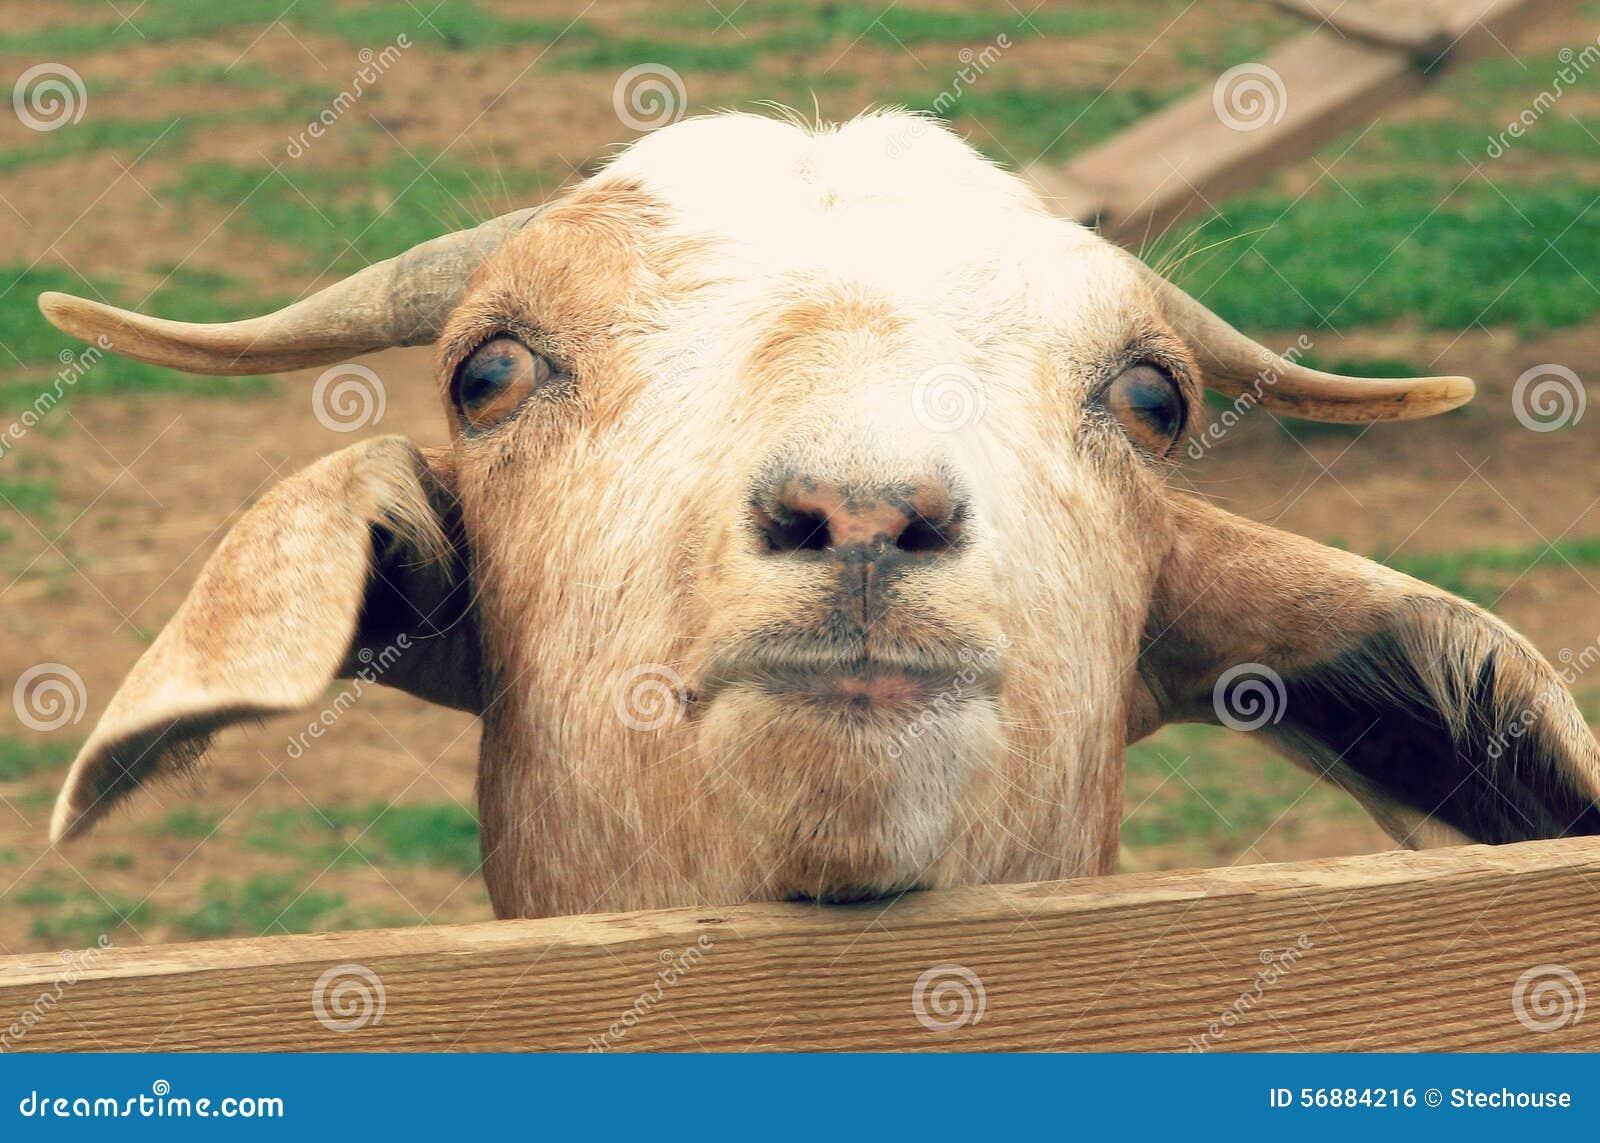 Una capra nel paese di Amish esamina un recinto